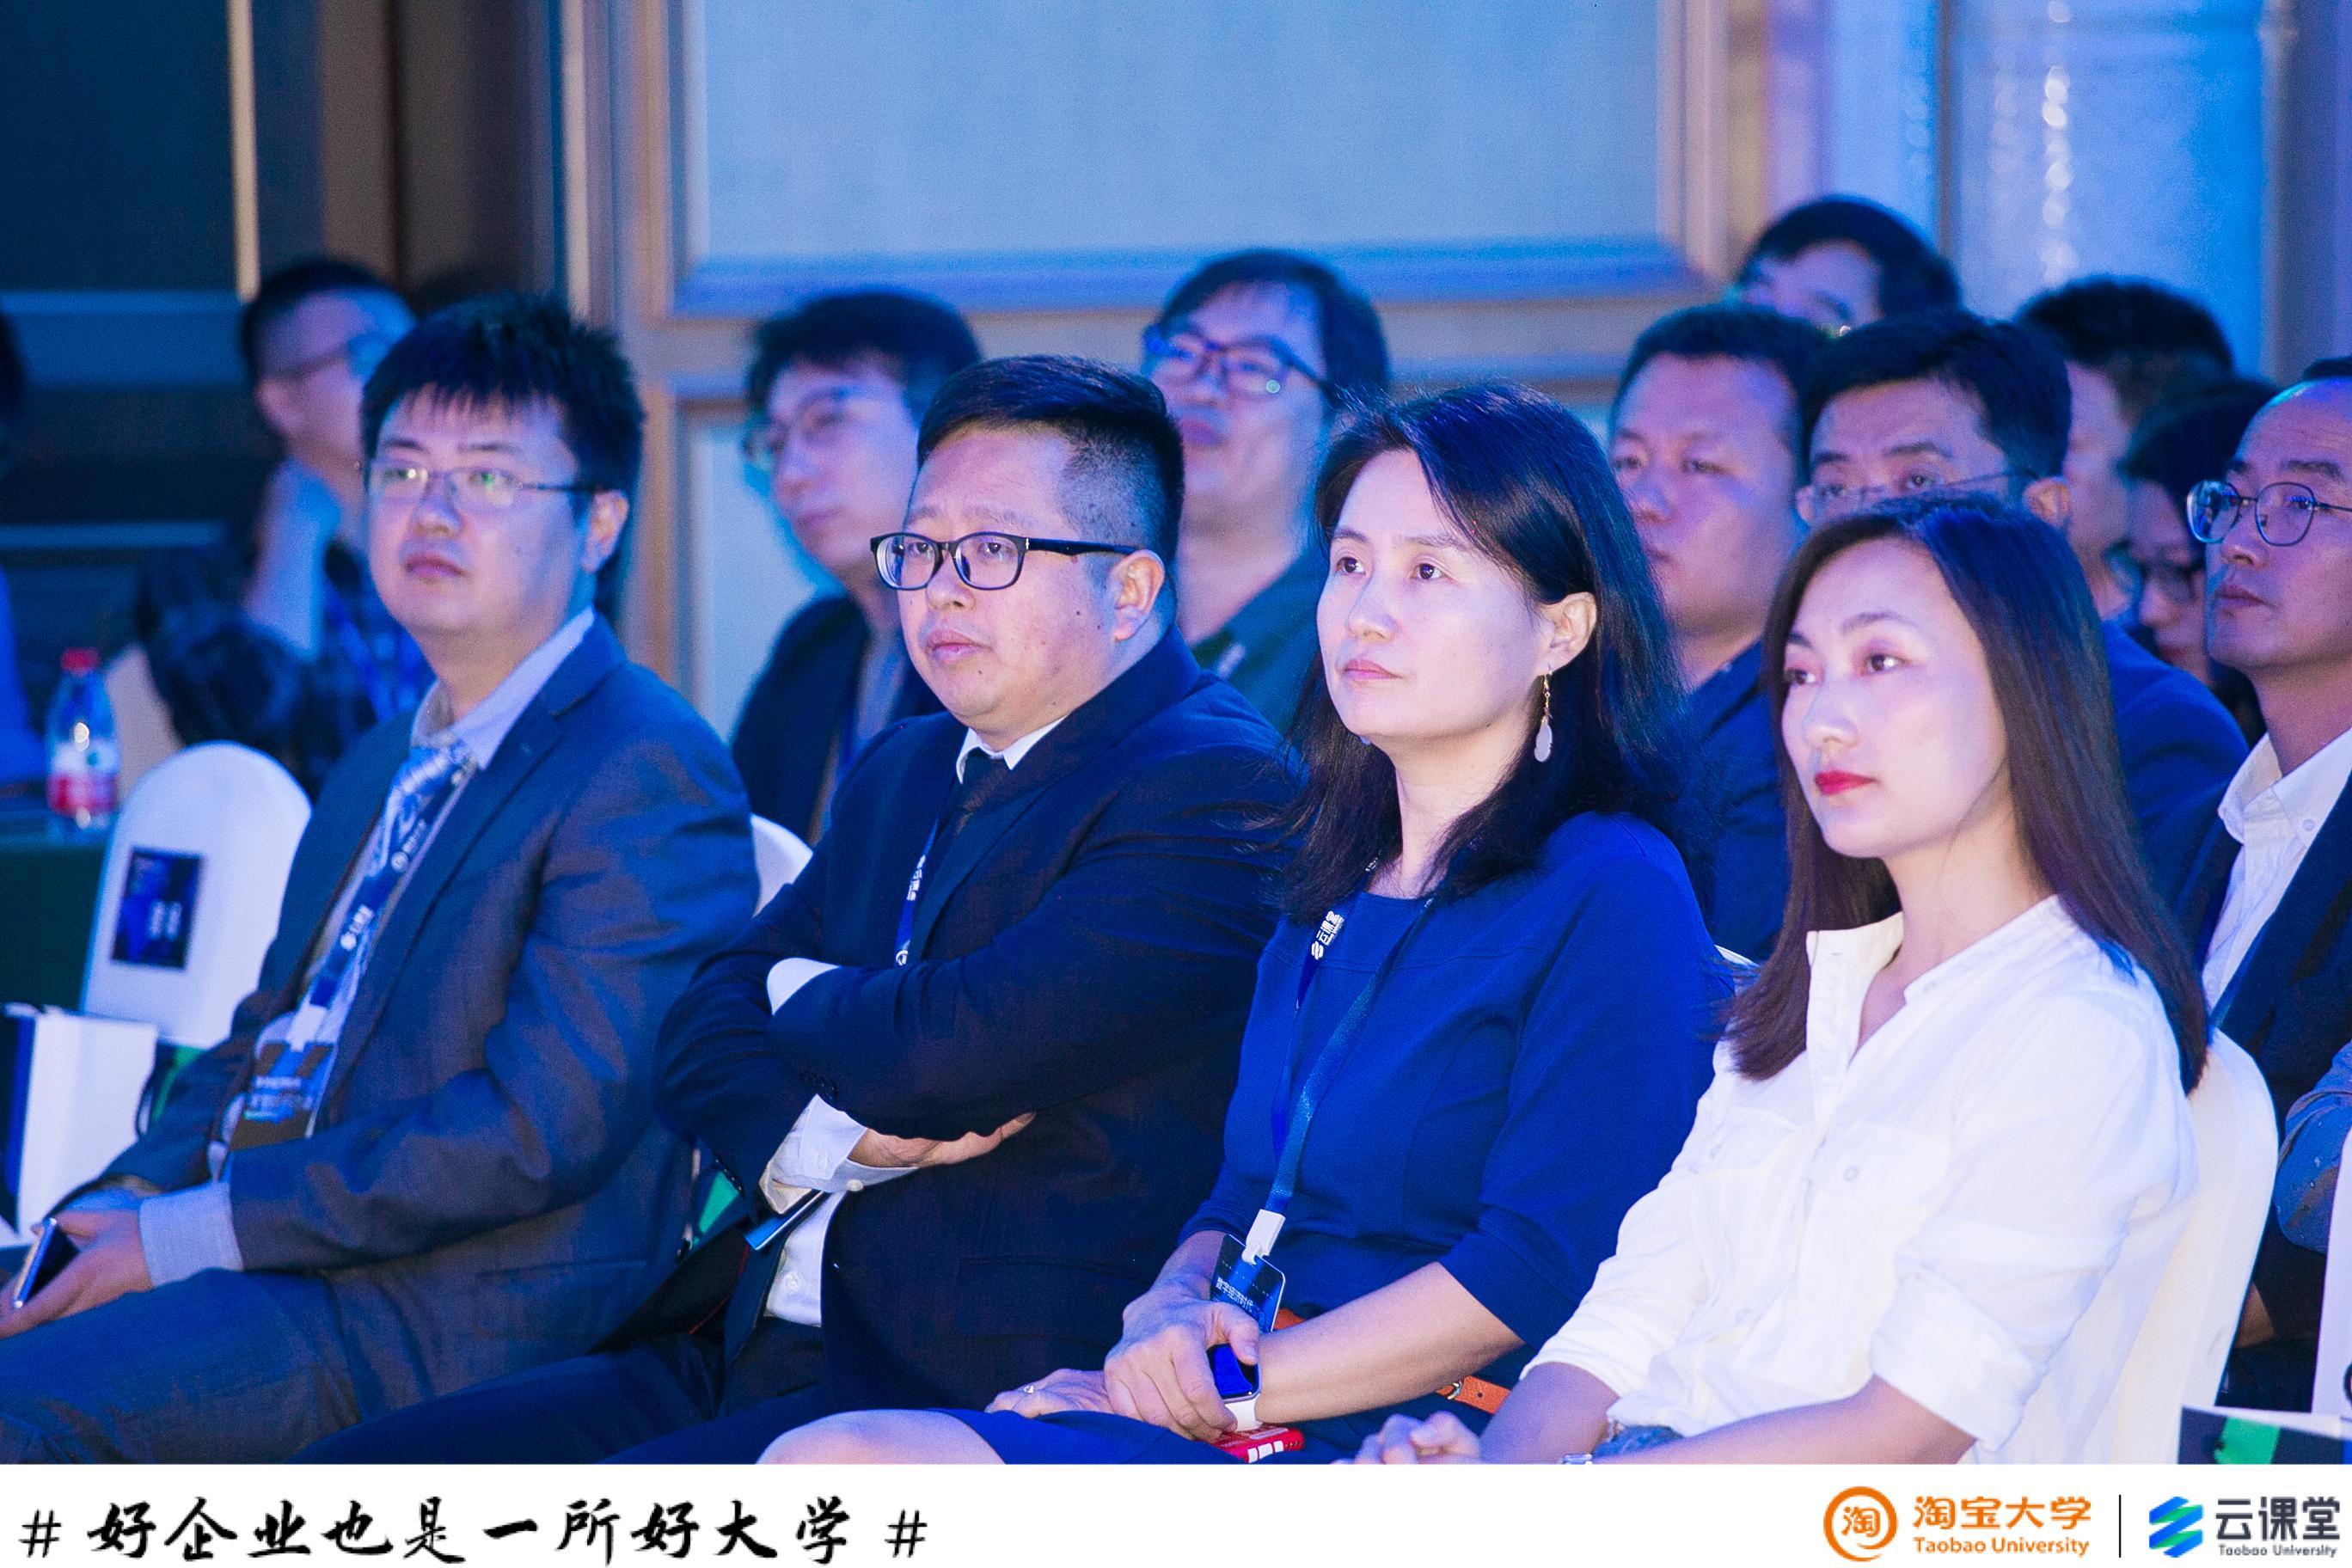 http://www.shangoudaohang.com/haitao/225786.html